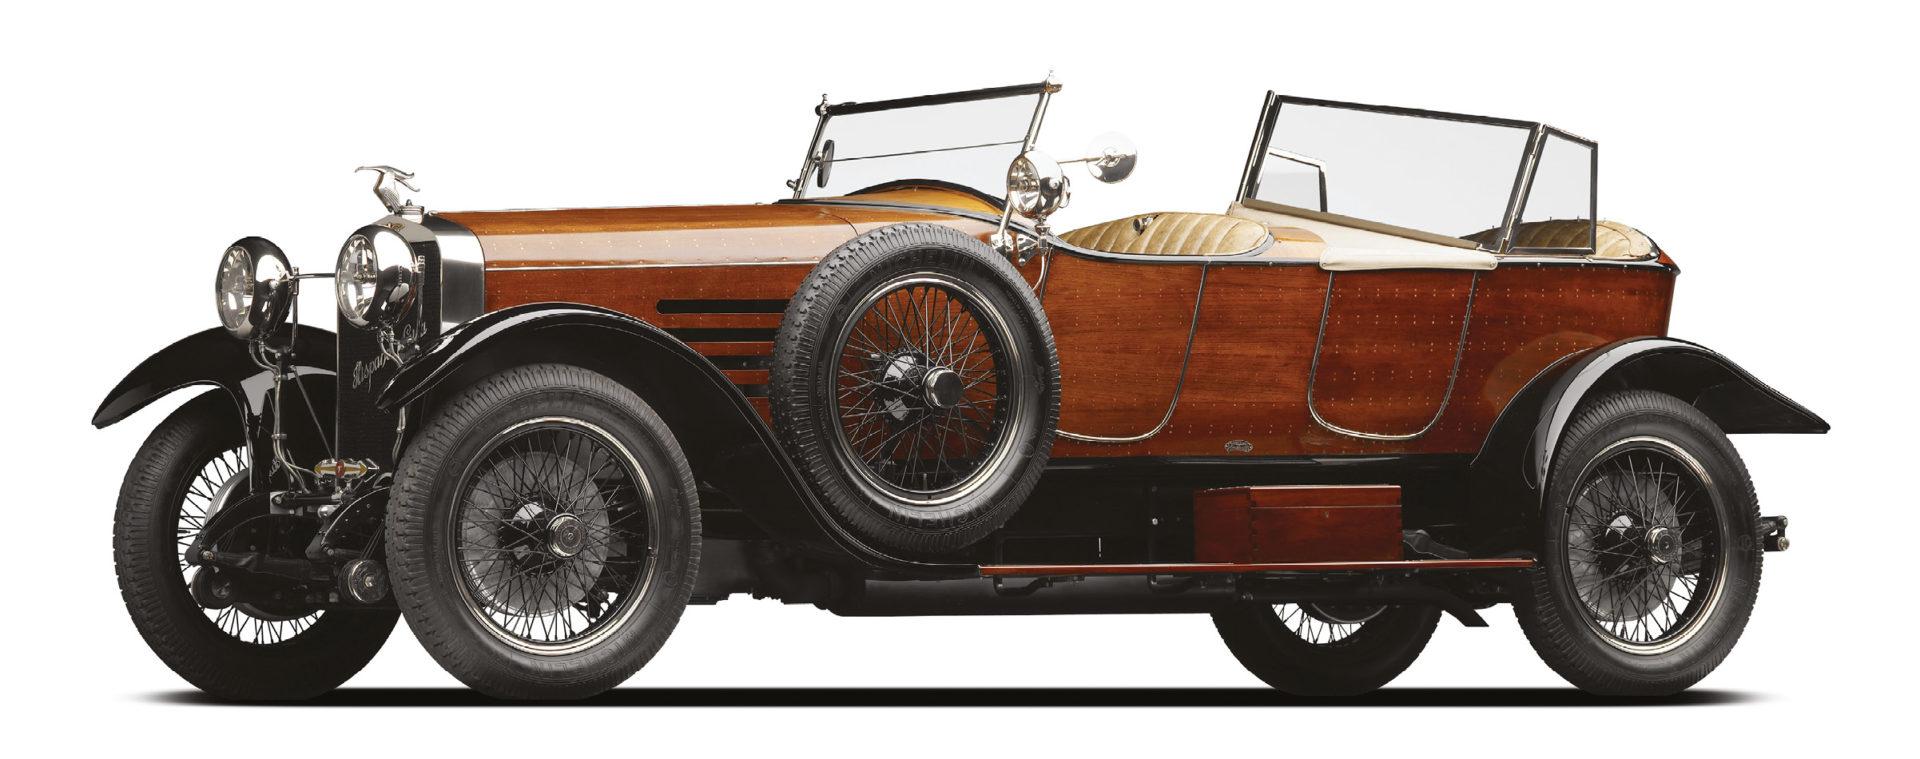 The Hispano-Suiza H6B